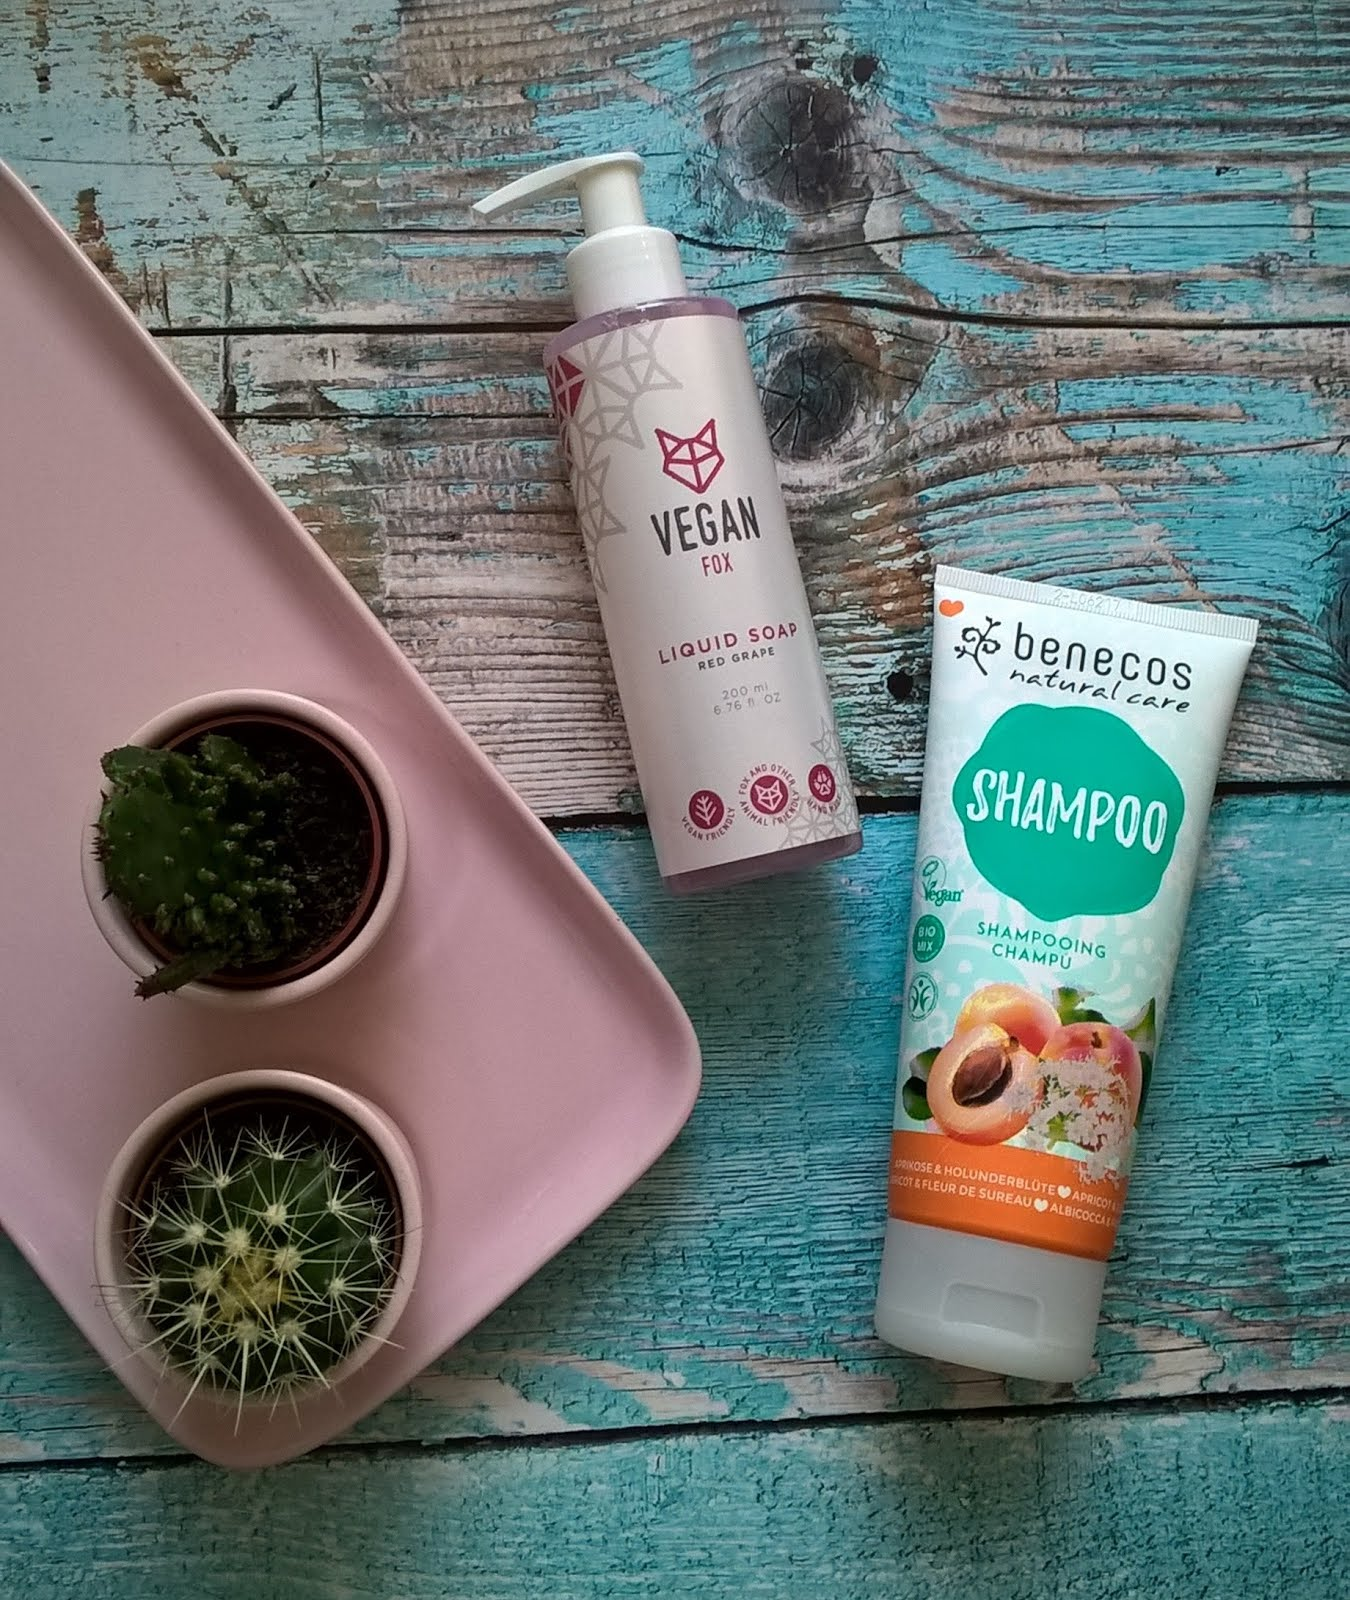 Urban Vegan Vegan Fox, Benecos szampon z morelą